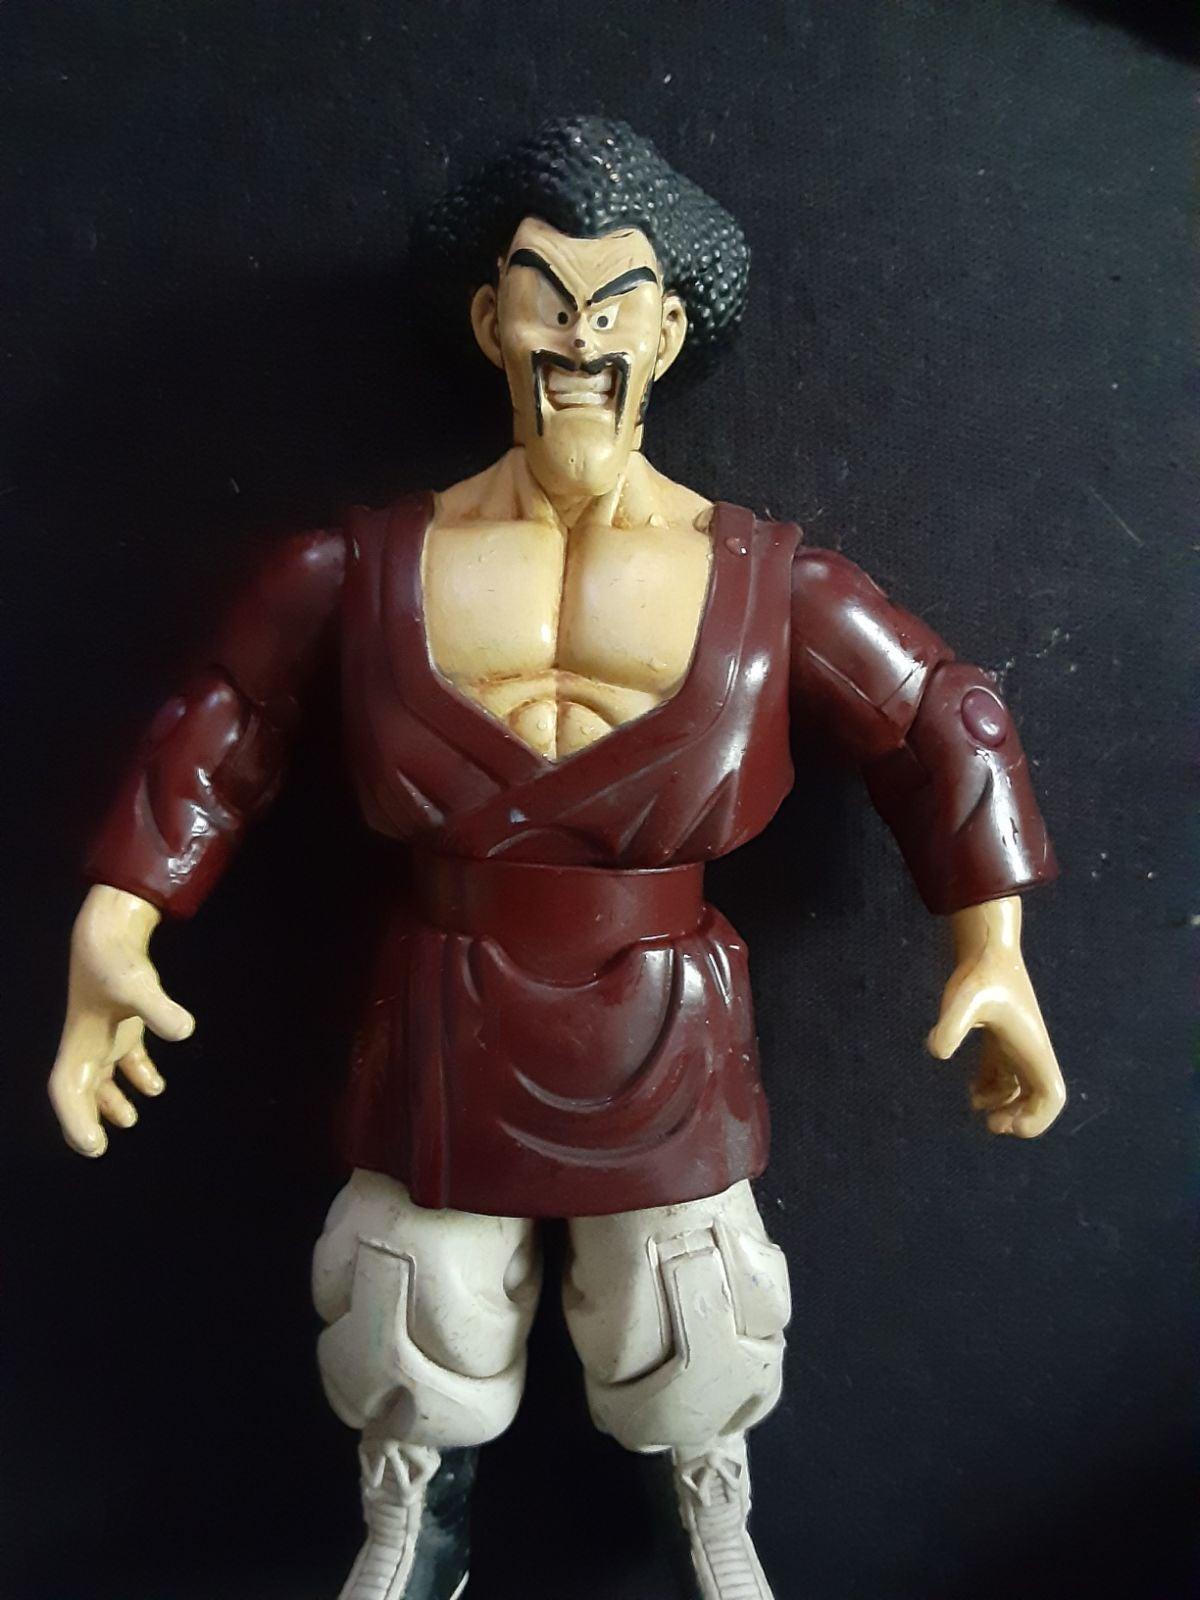 DBZ Mr.satan figure